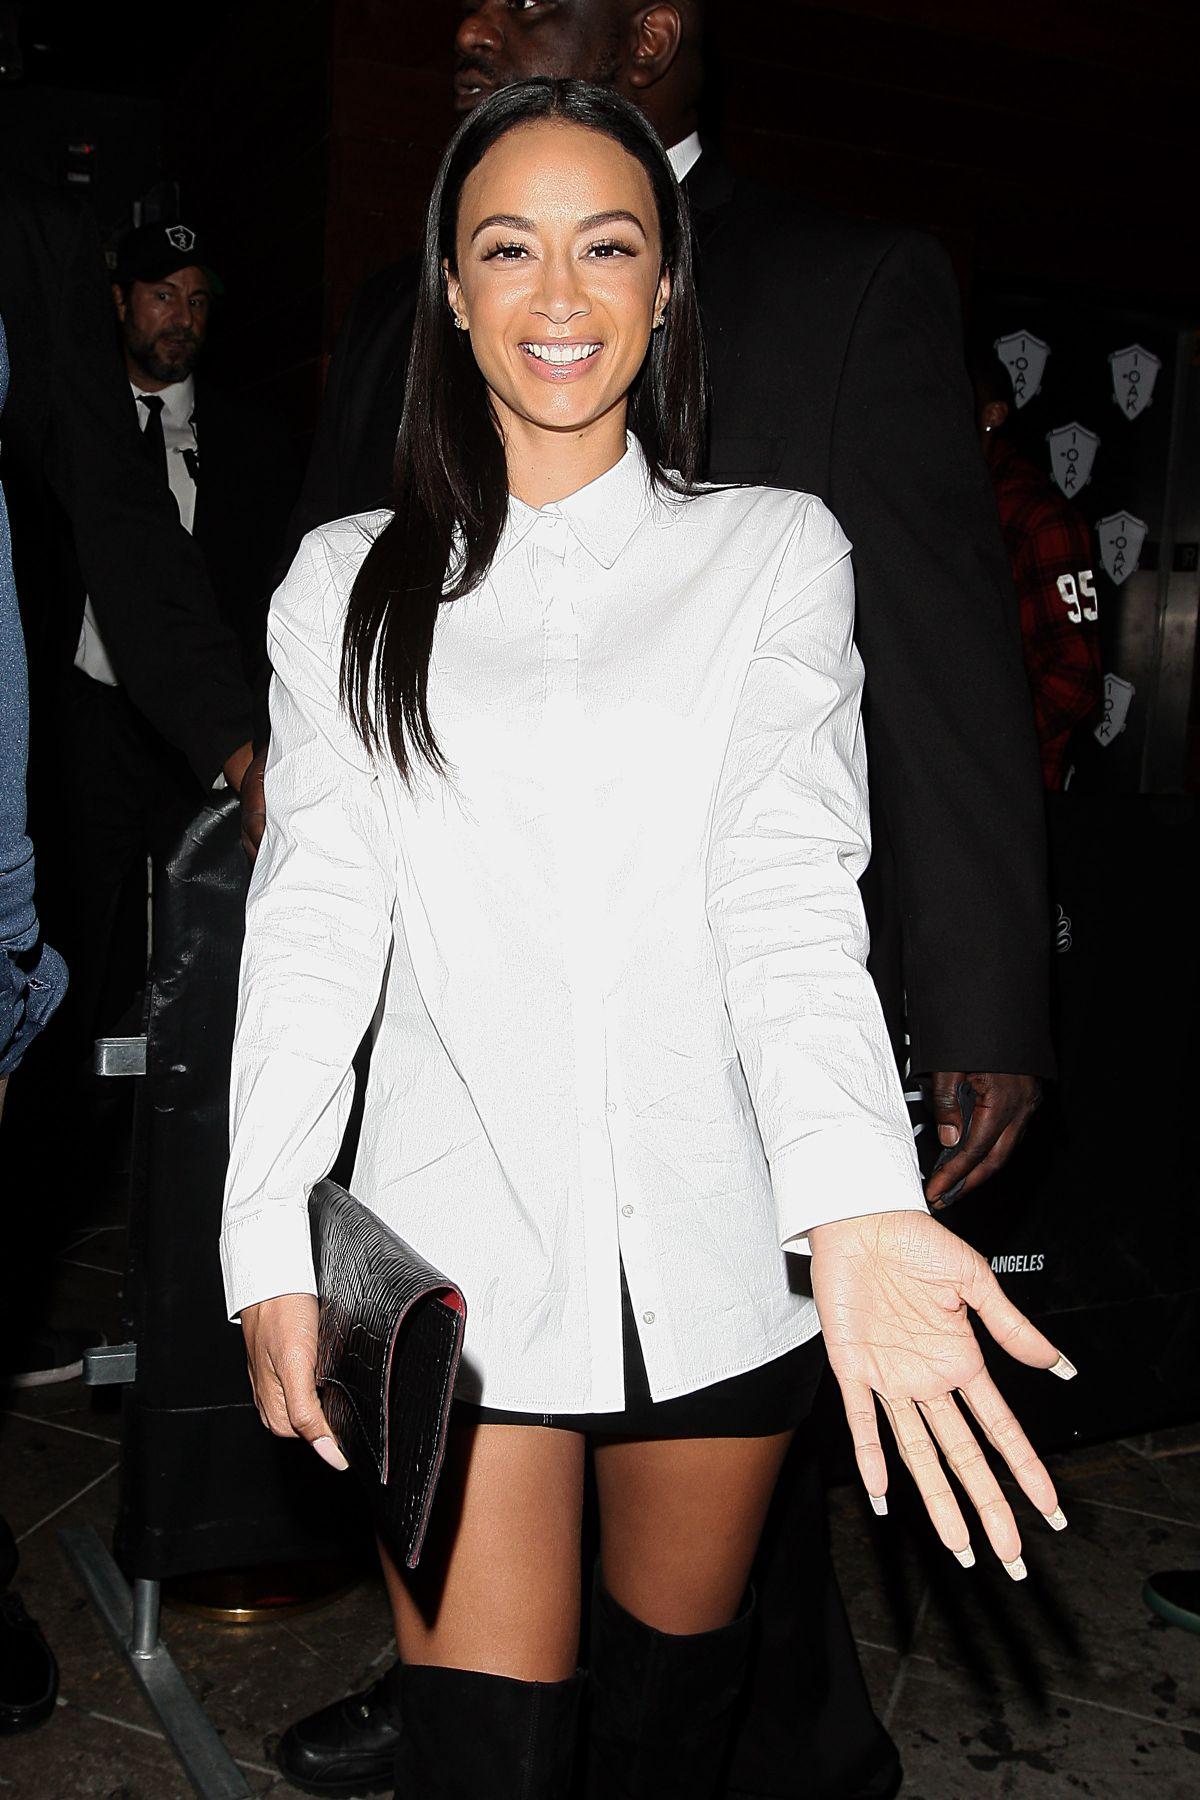 DRAYA MICHELE at 1Oak Nightclub in Los Angeles 06/09/2015 ...